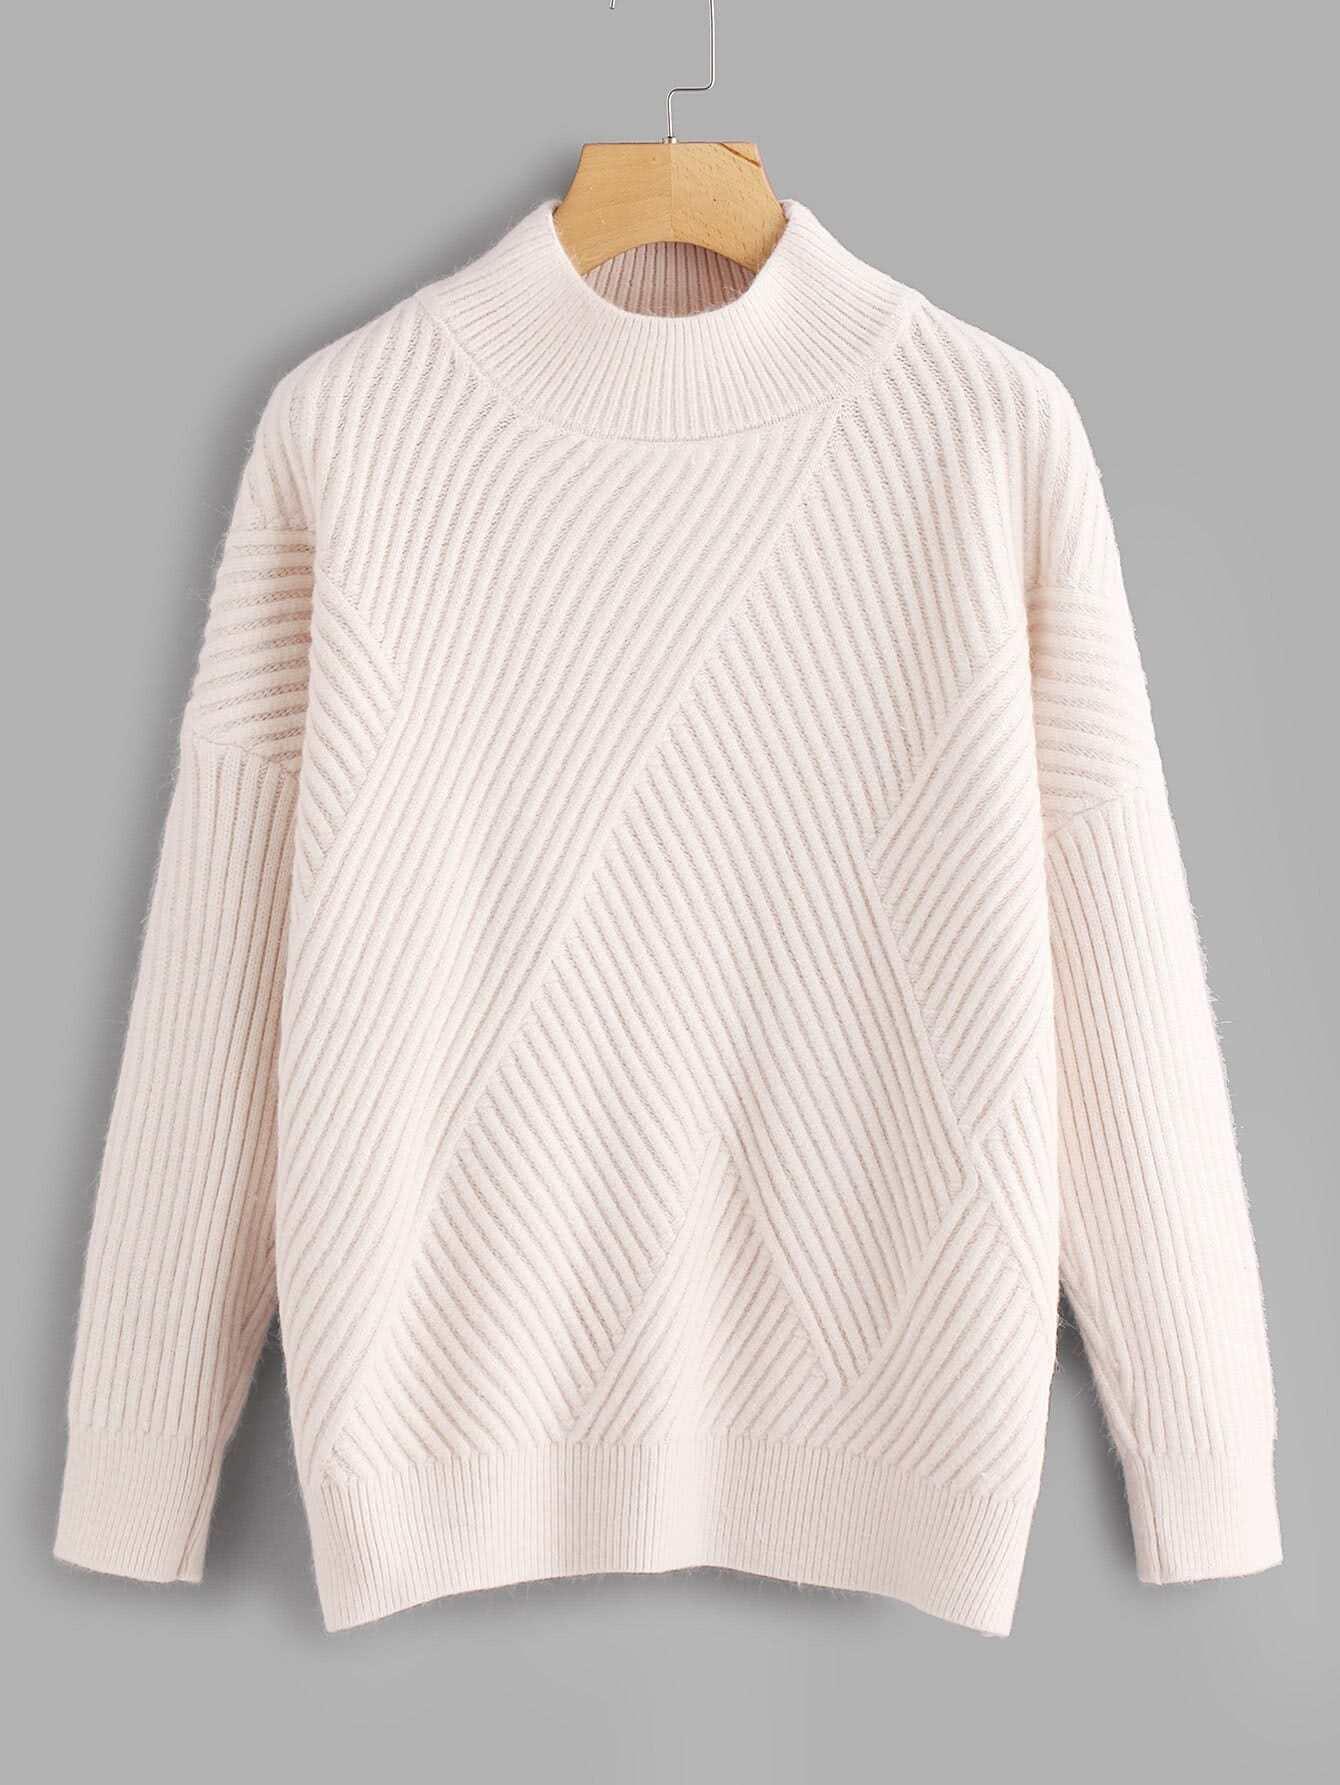 Side Slit Rib Knit Sweater sweater171121201